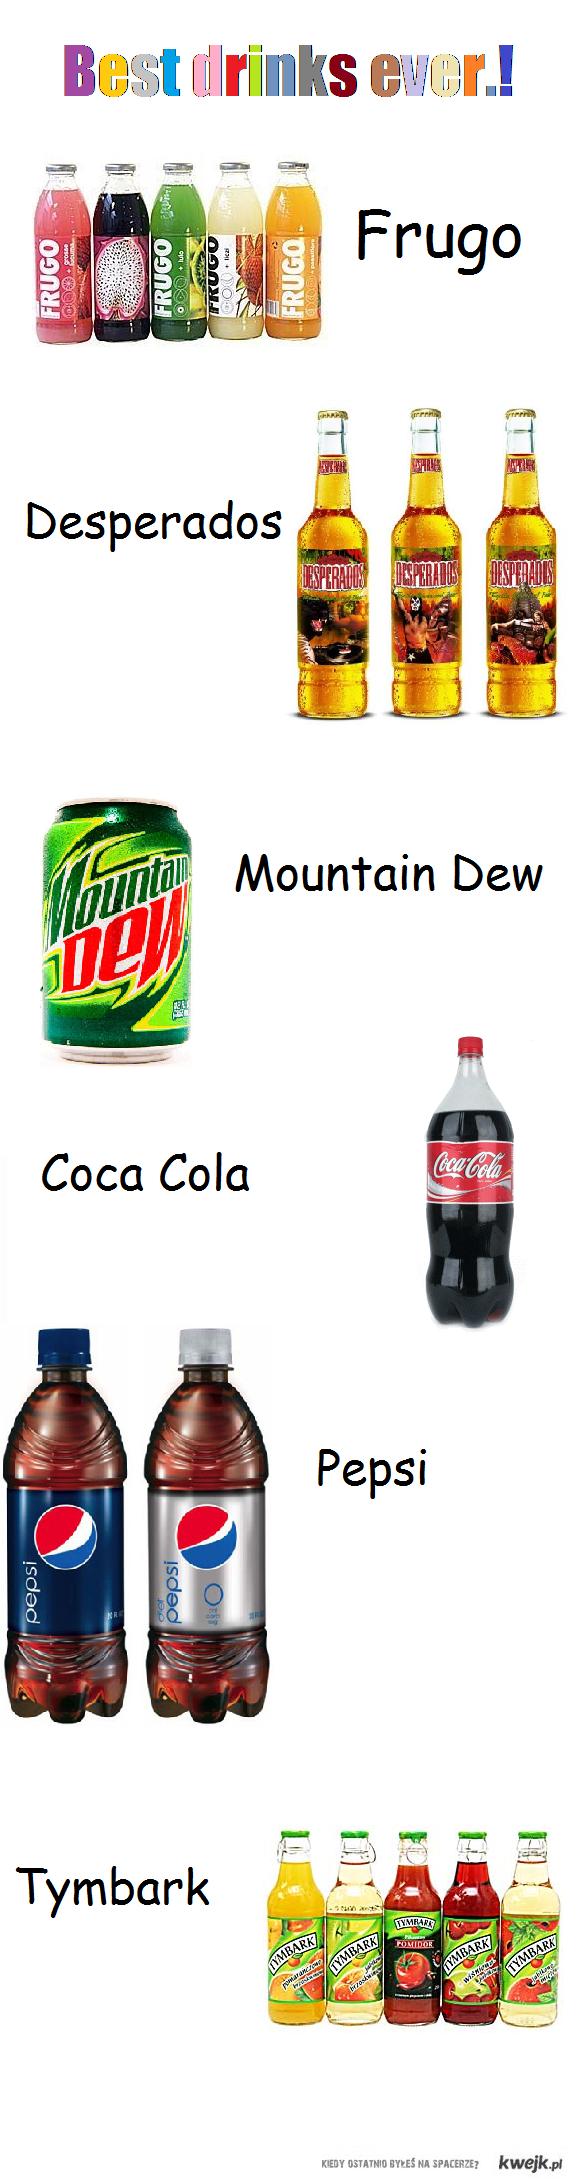 Best drinks ever.!